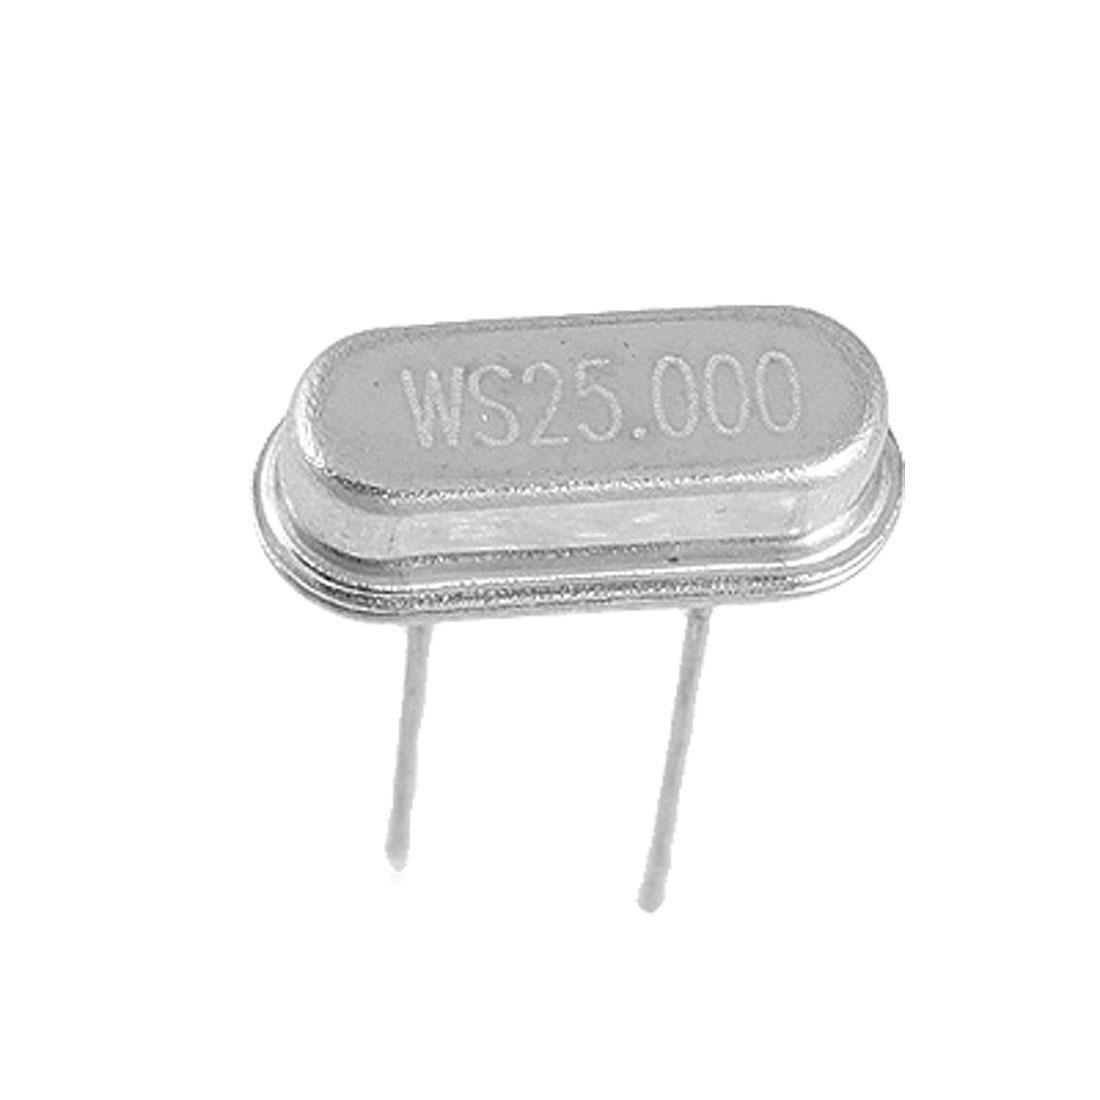 50 x 25.000MHz 25M Hz Crystal Oscillator HC-49S Low Profile